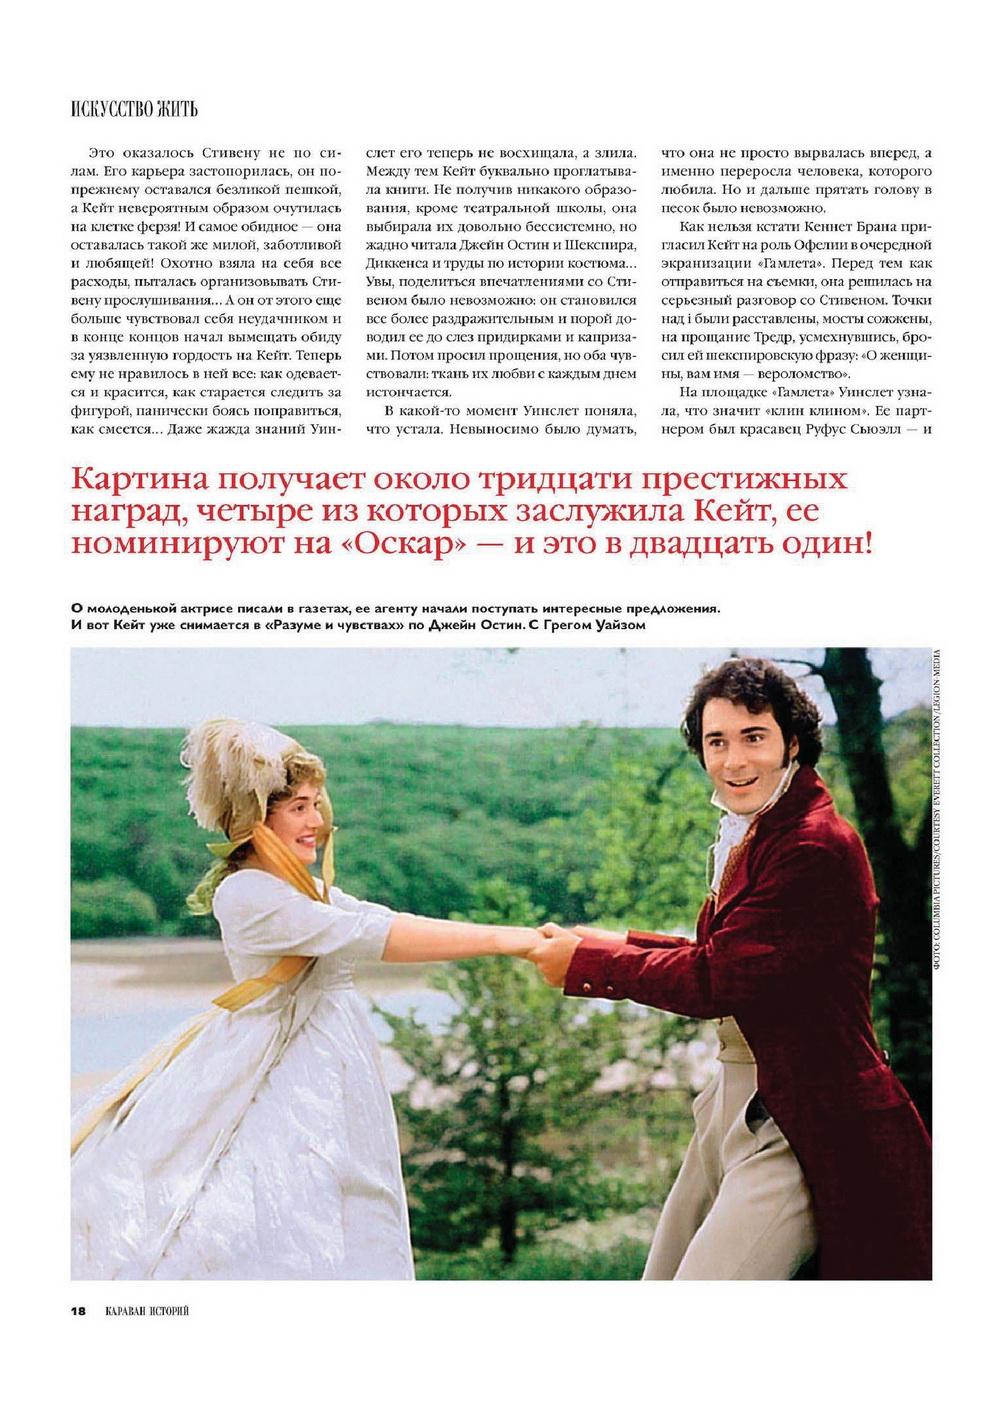 http://i1.imageban.ru/out/2017/08/01/46ee49d732006fcc148a825b15ef5482.jpg